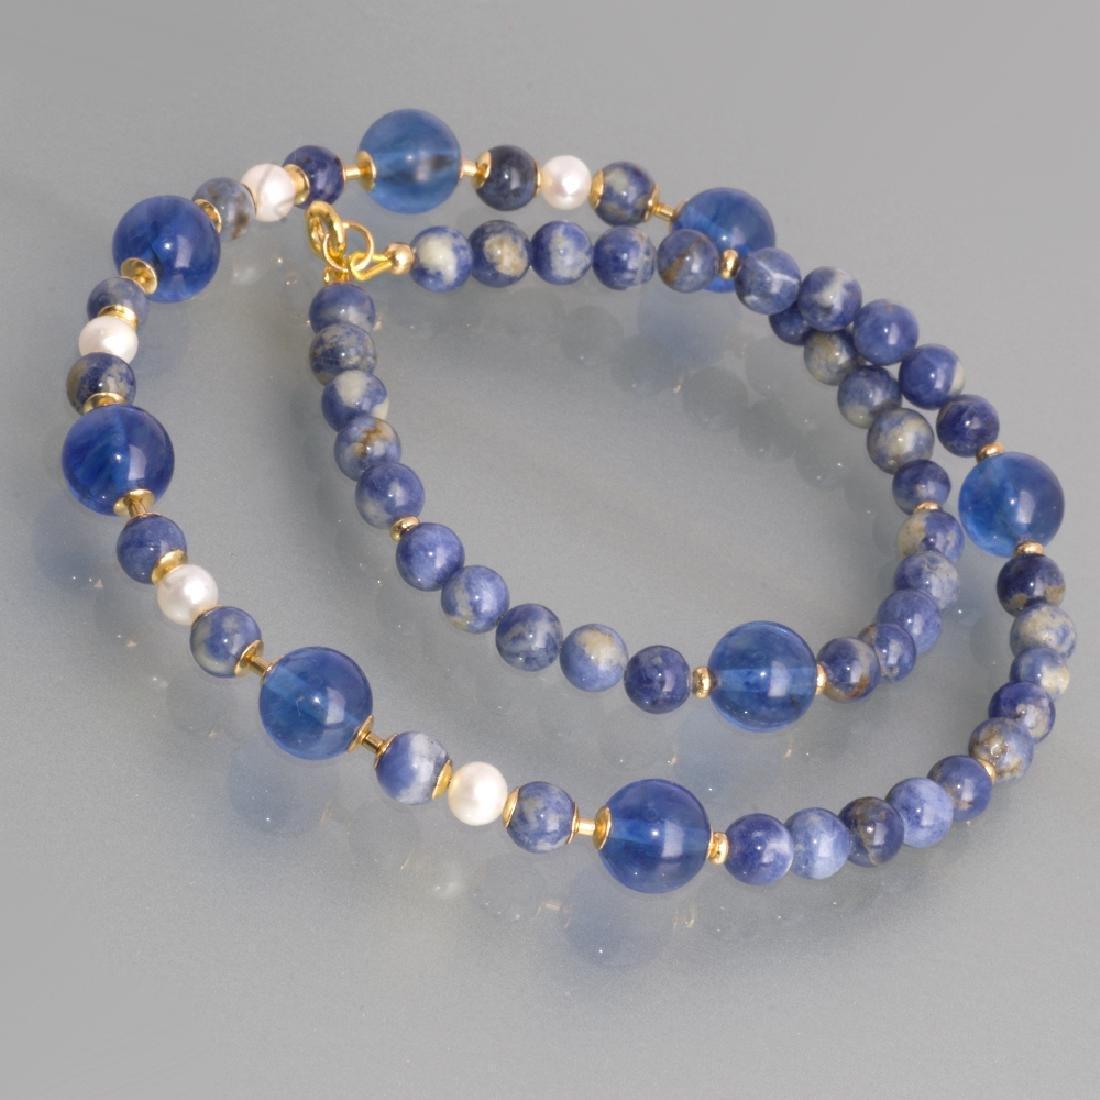 Sodalite and Capri quartz necklace with Pearls - 5